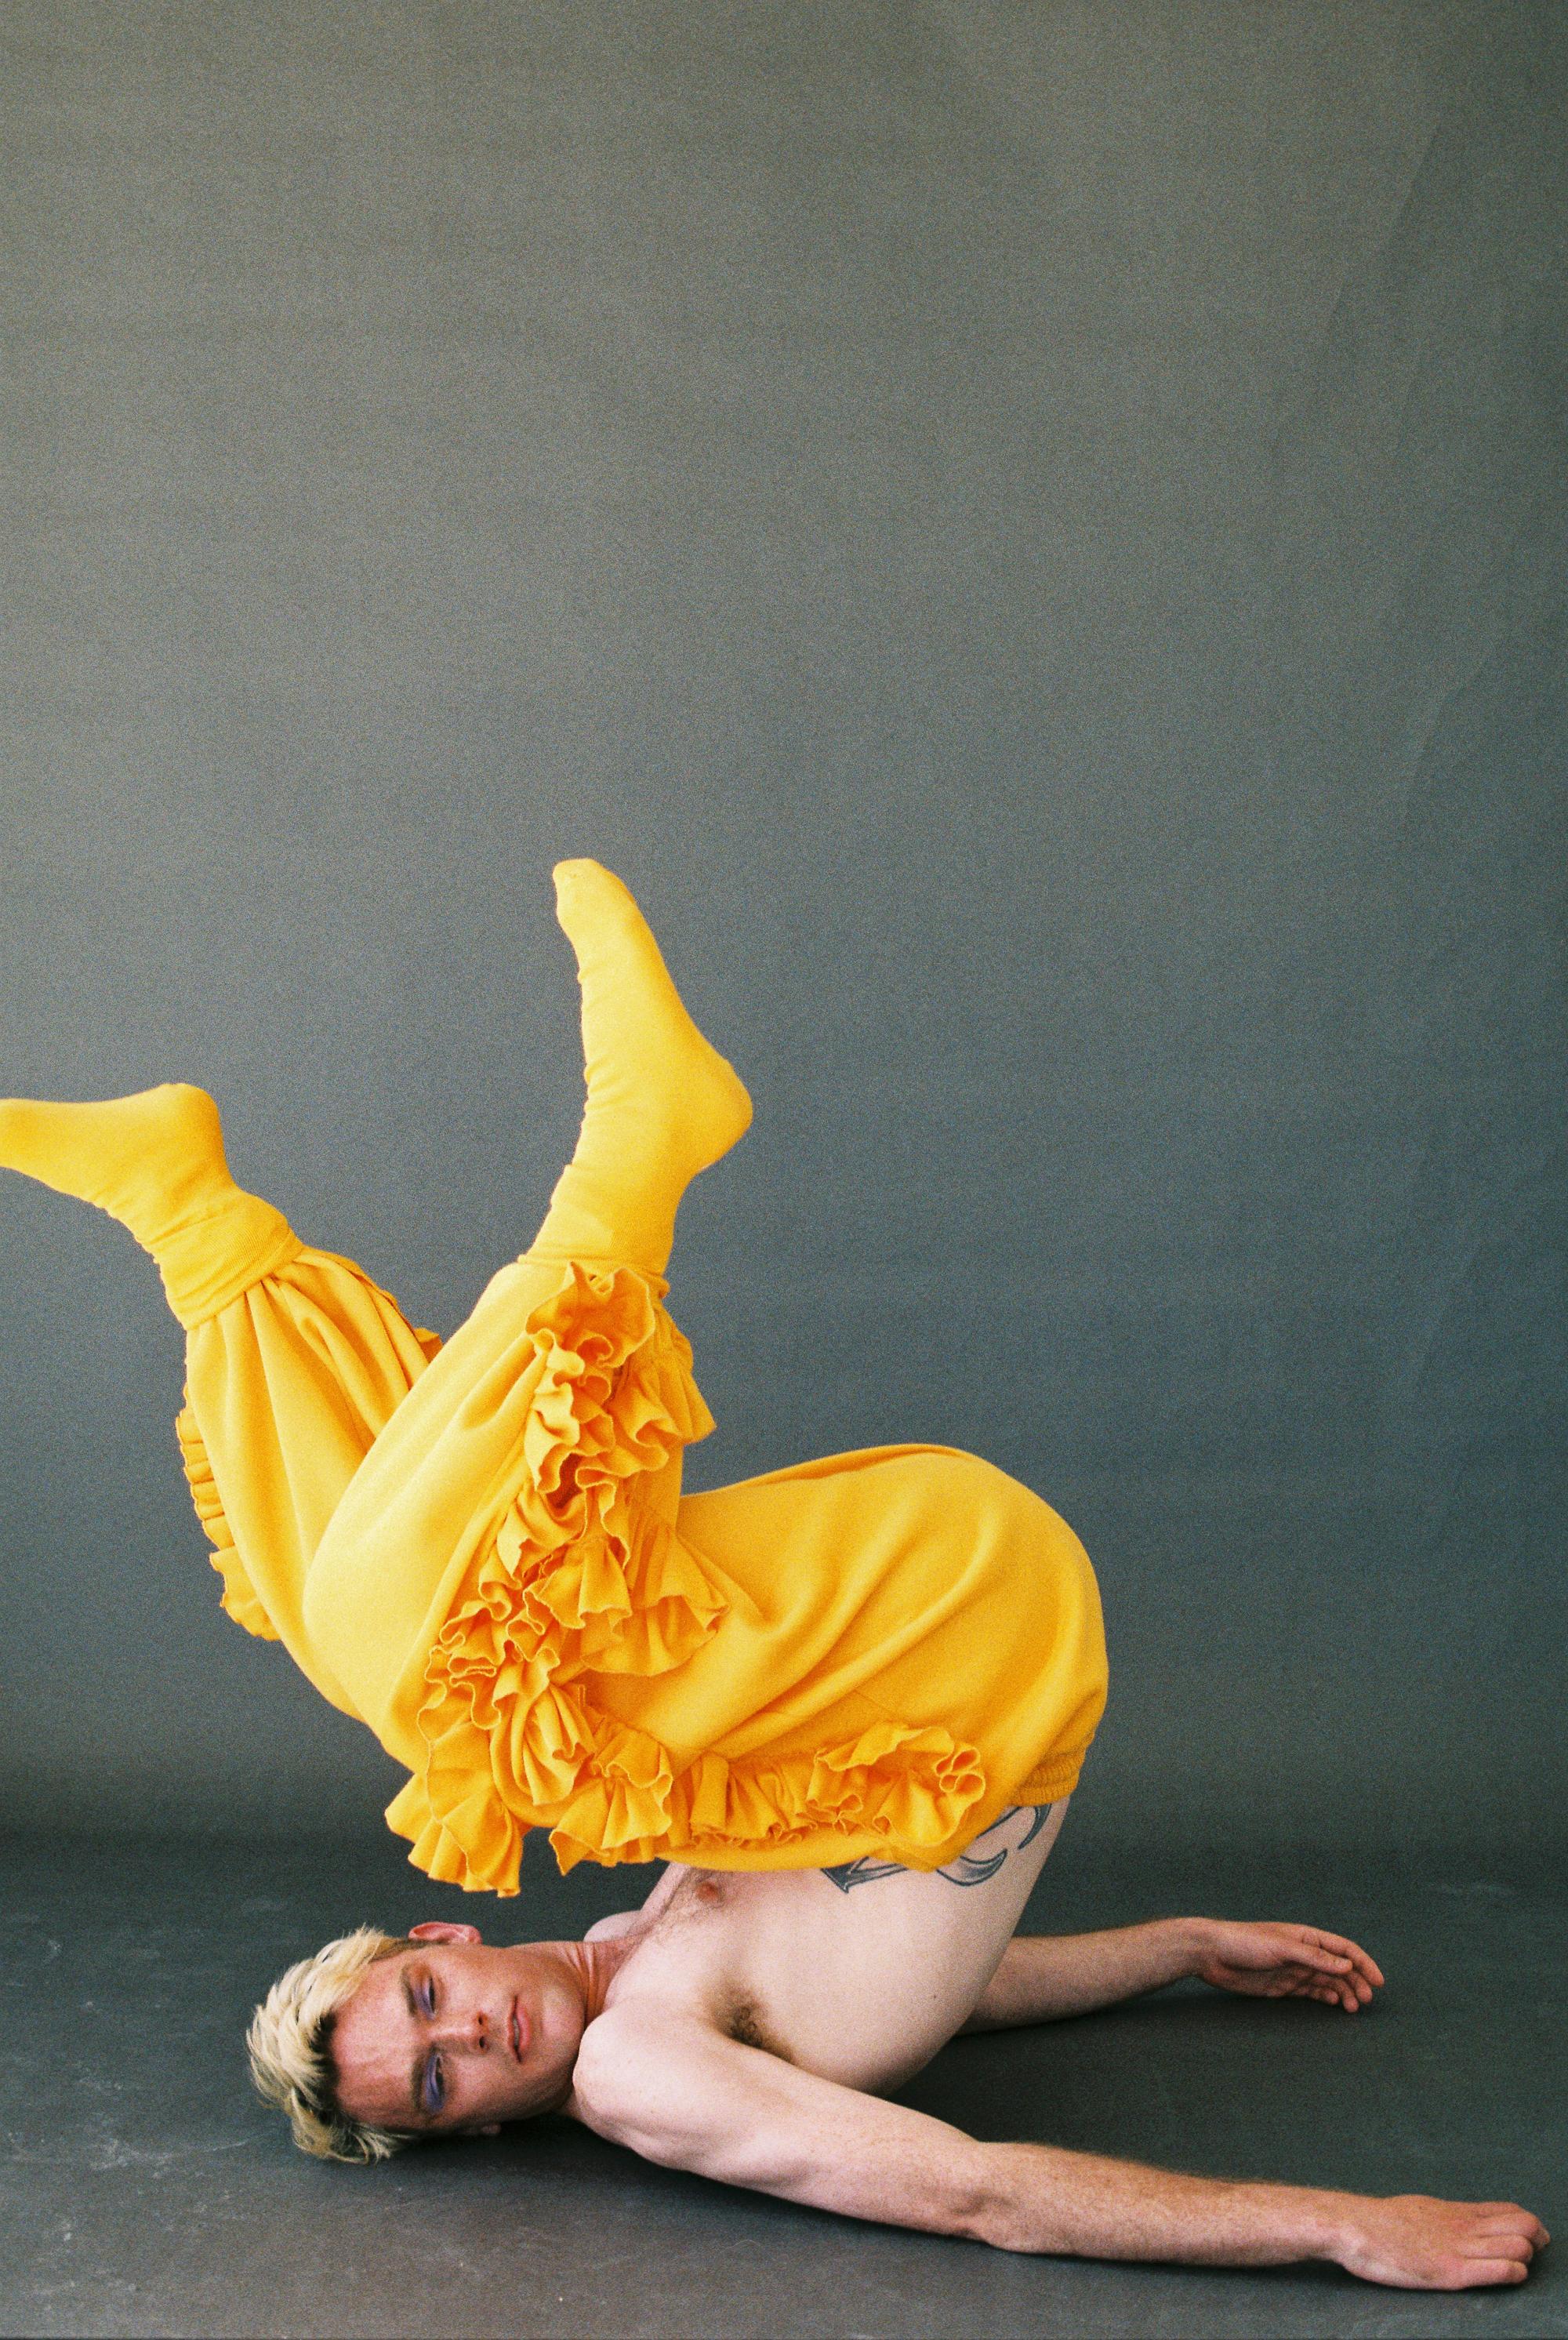 BRUNSWICK STUDIOS AW18  Photography:  Lekk Porter   Models:  Liam Seear-Budd ,  Michele Li  and  Casey Venning   HMUA:  Naomi Retman